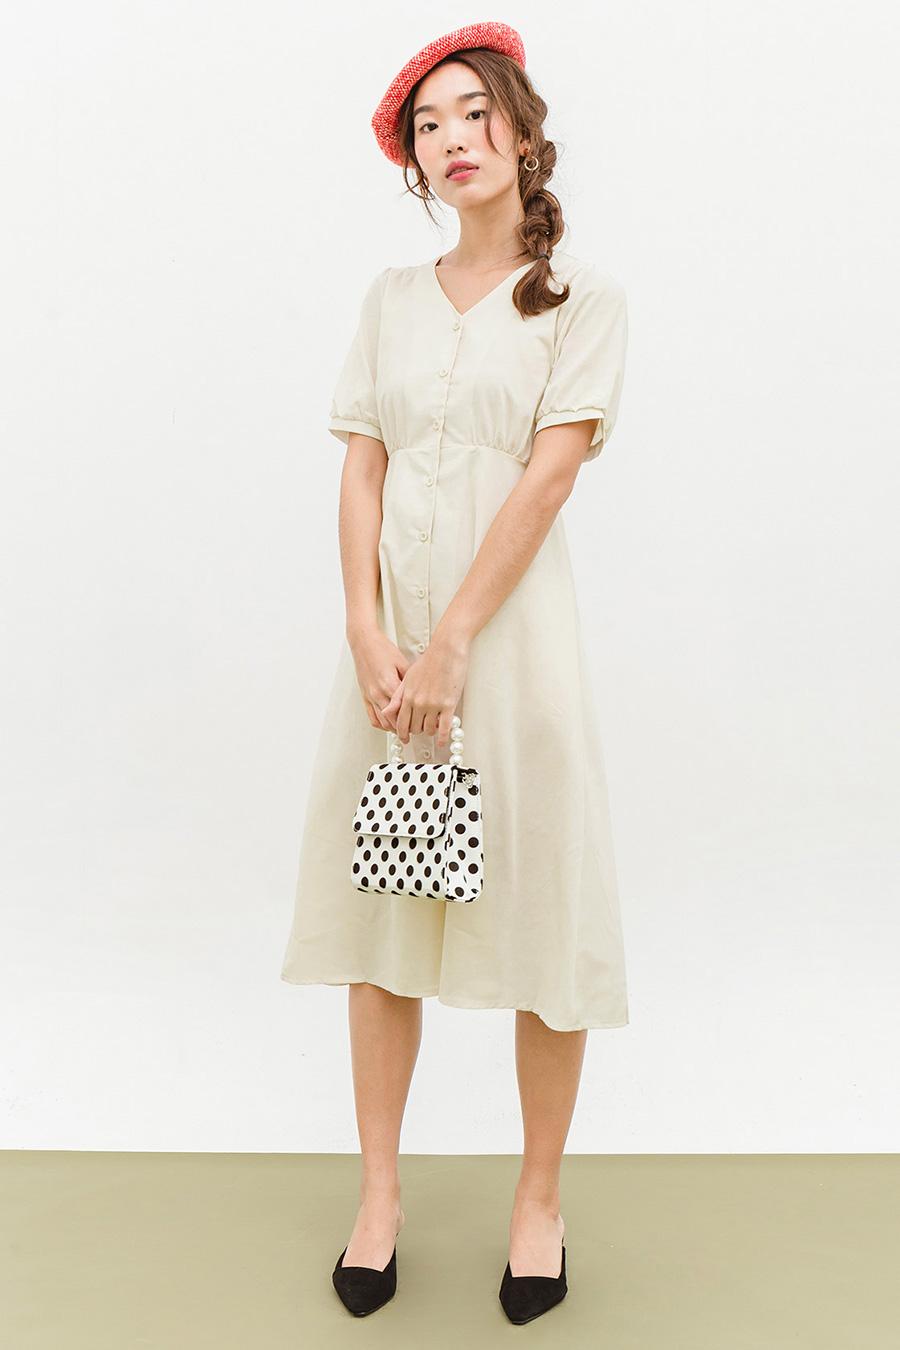 ELLERY DRESS - BISCOTTI